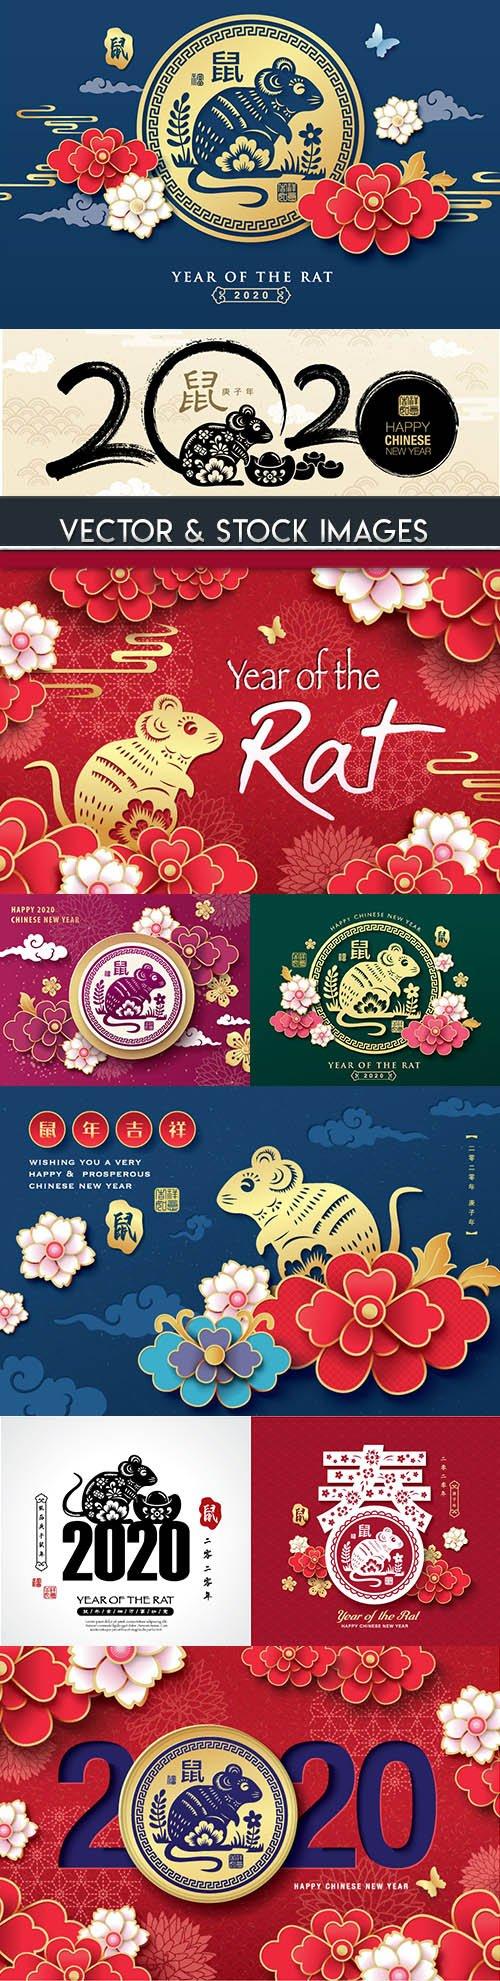 Rat symbol New Year 2020 cartoon illustration 4